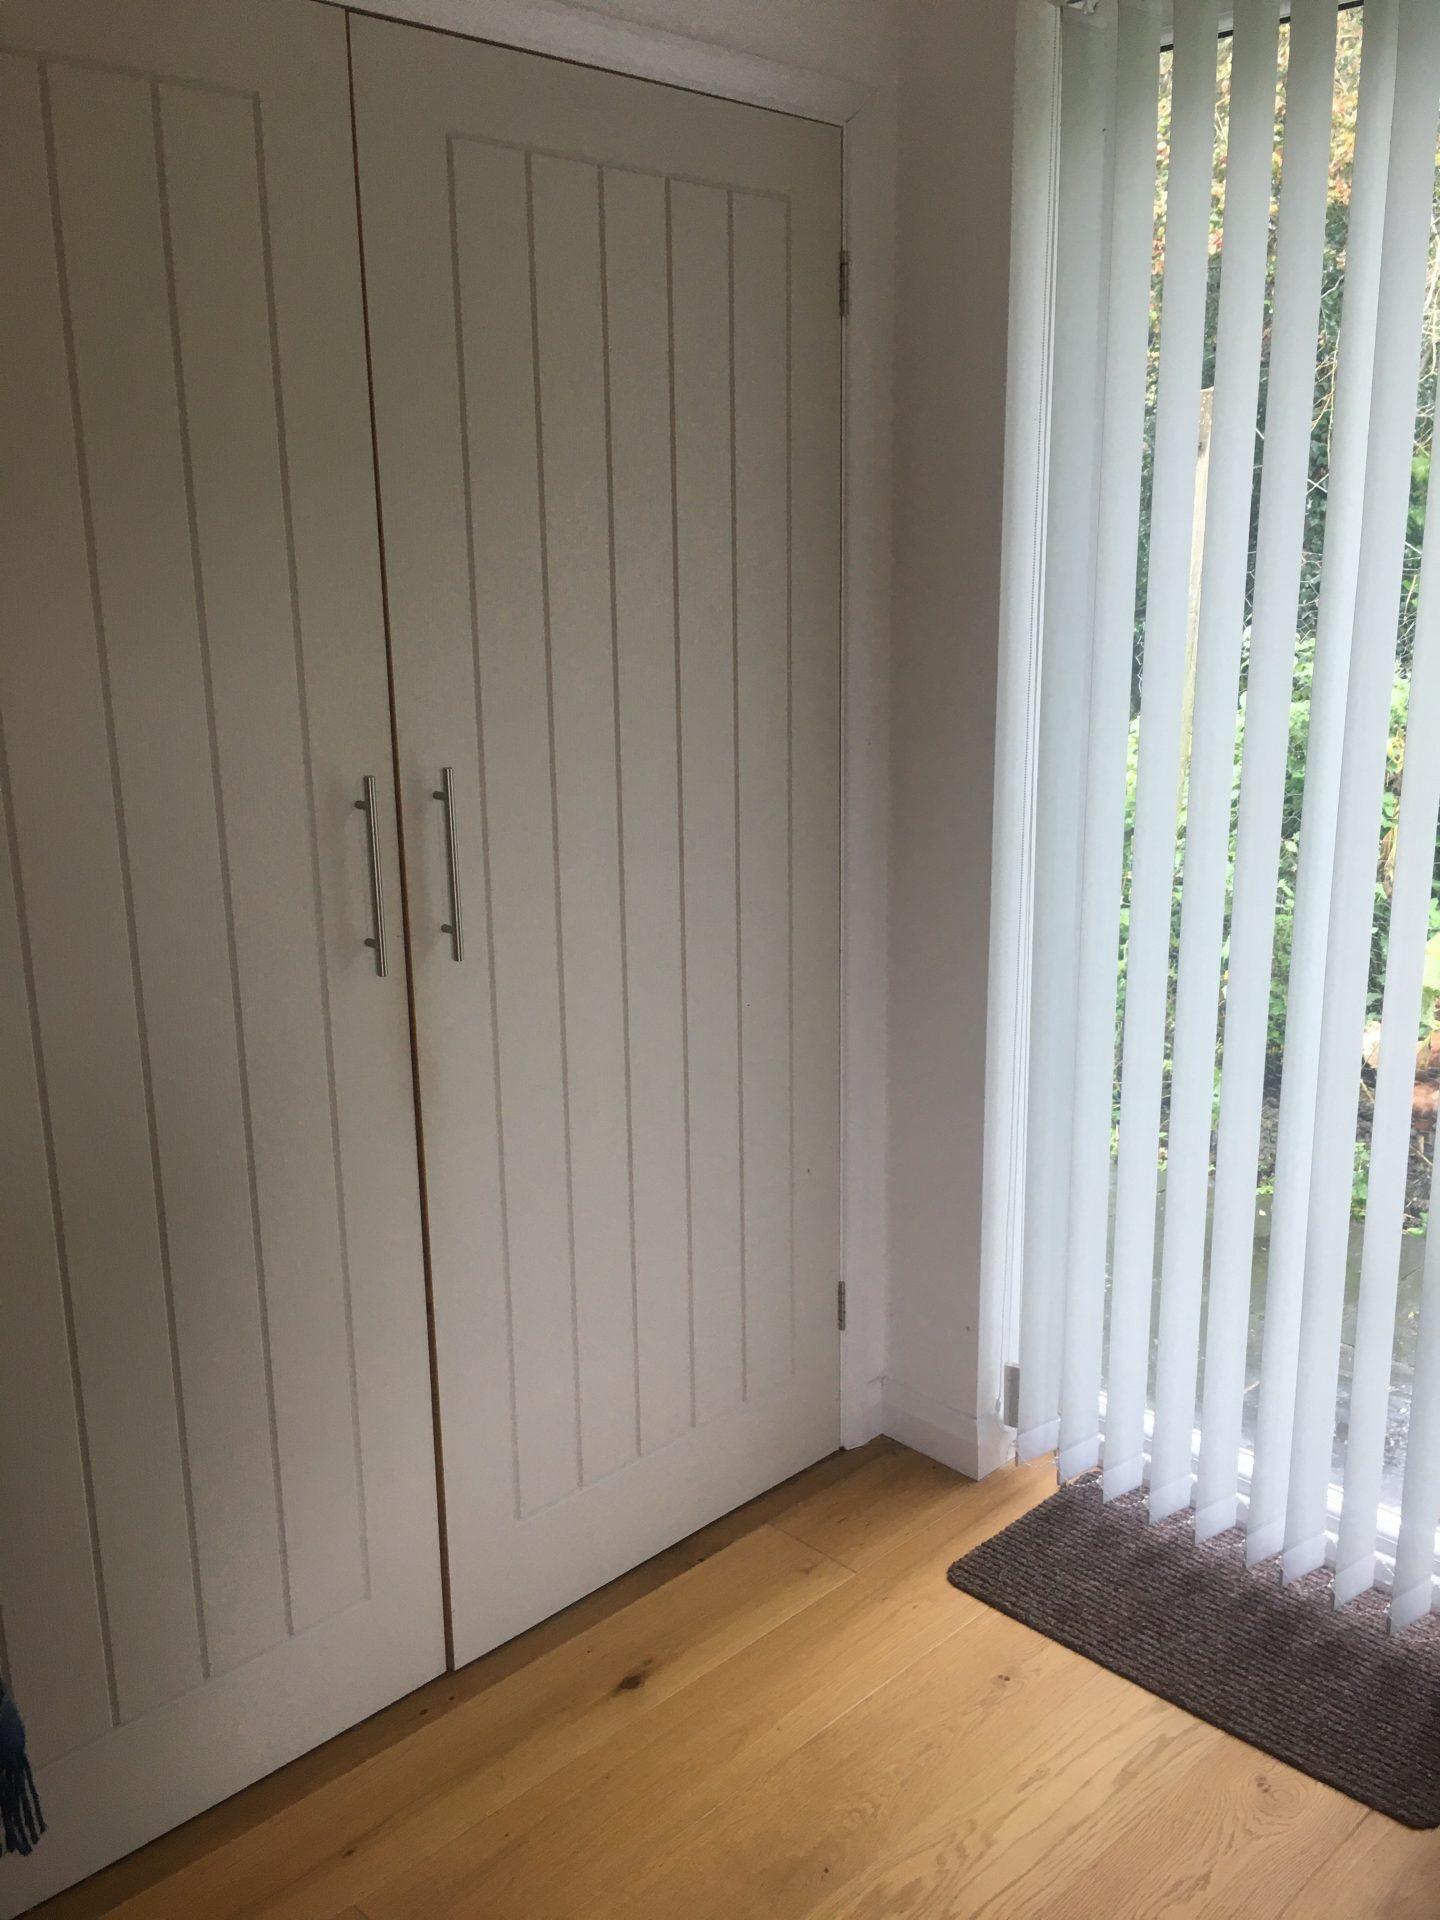 Moorlea Annexe, London Apprentice PL26 7AR